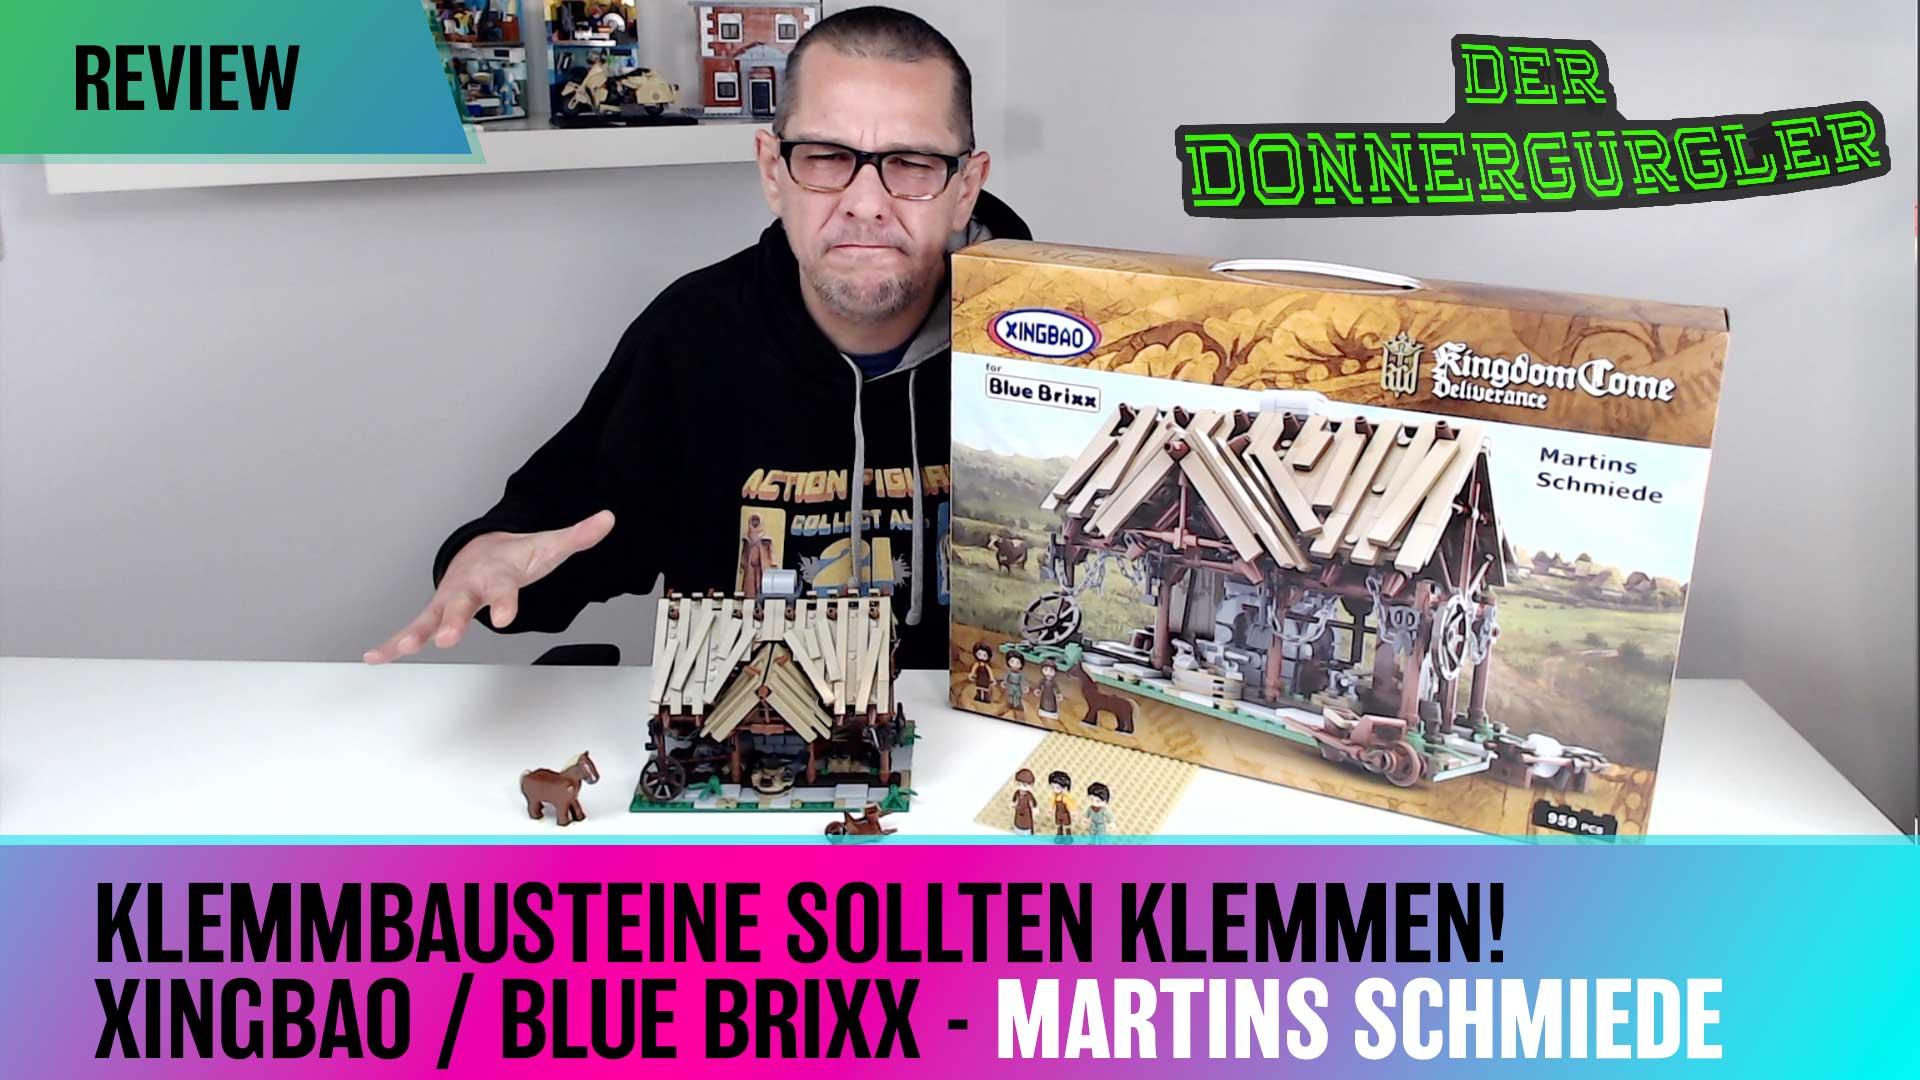 Klemmbausteine sollten klemmen! Xingbao / Bluebrixx Kingdom Come Deliverance Martins Schmiede.